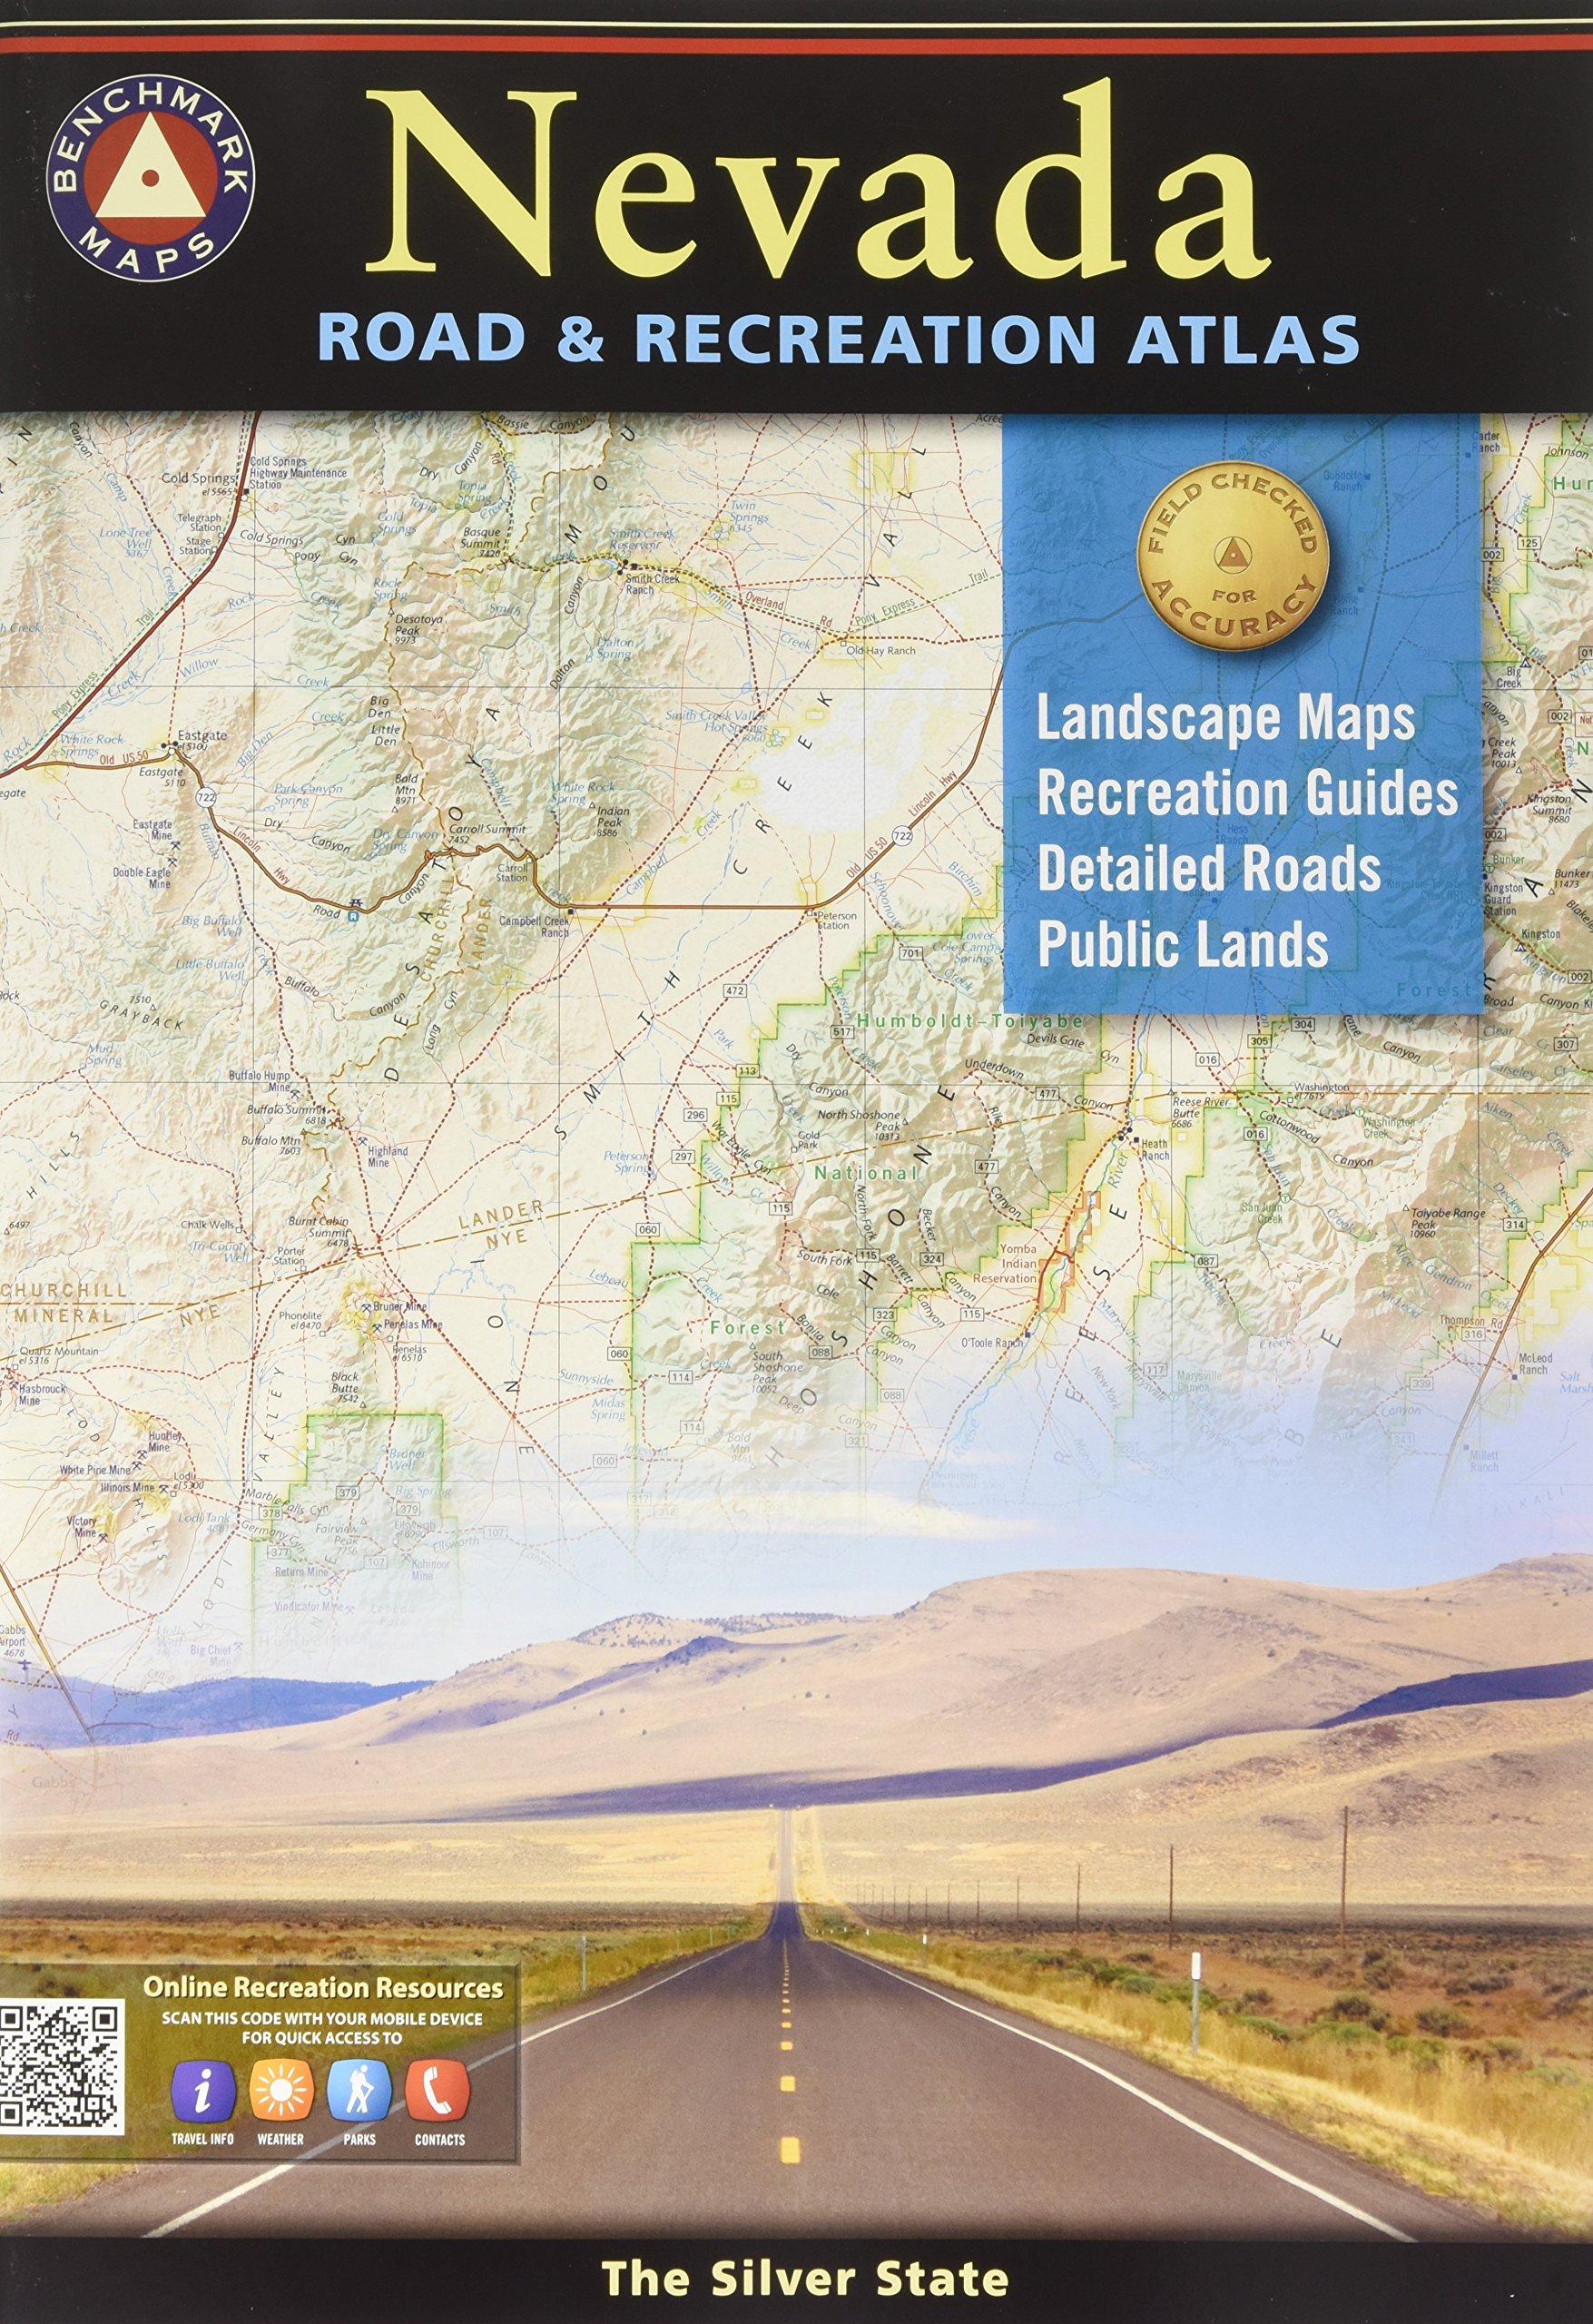 Nevada Road & Recreation Atlas: 6th Edition by Benchmark